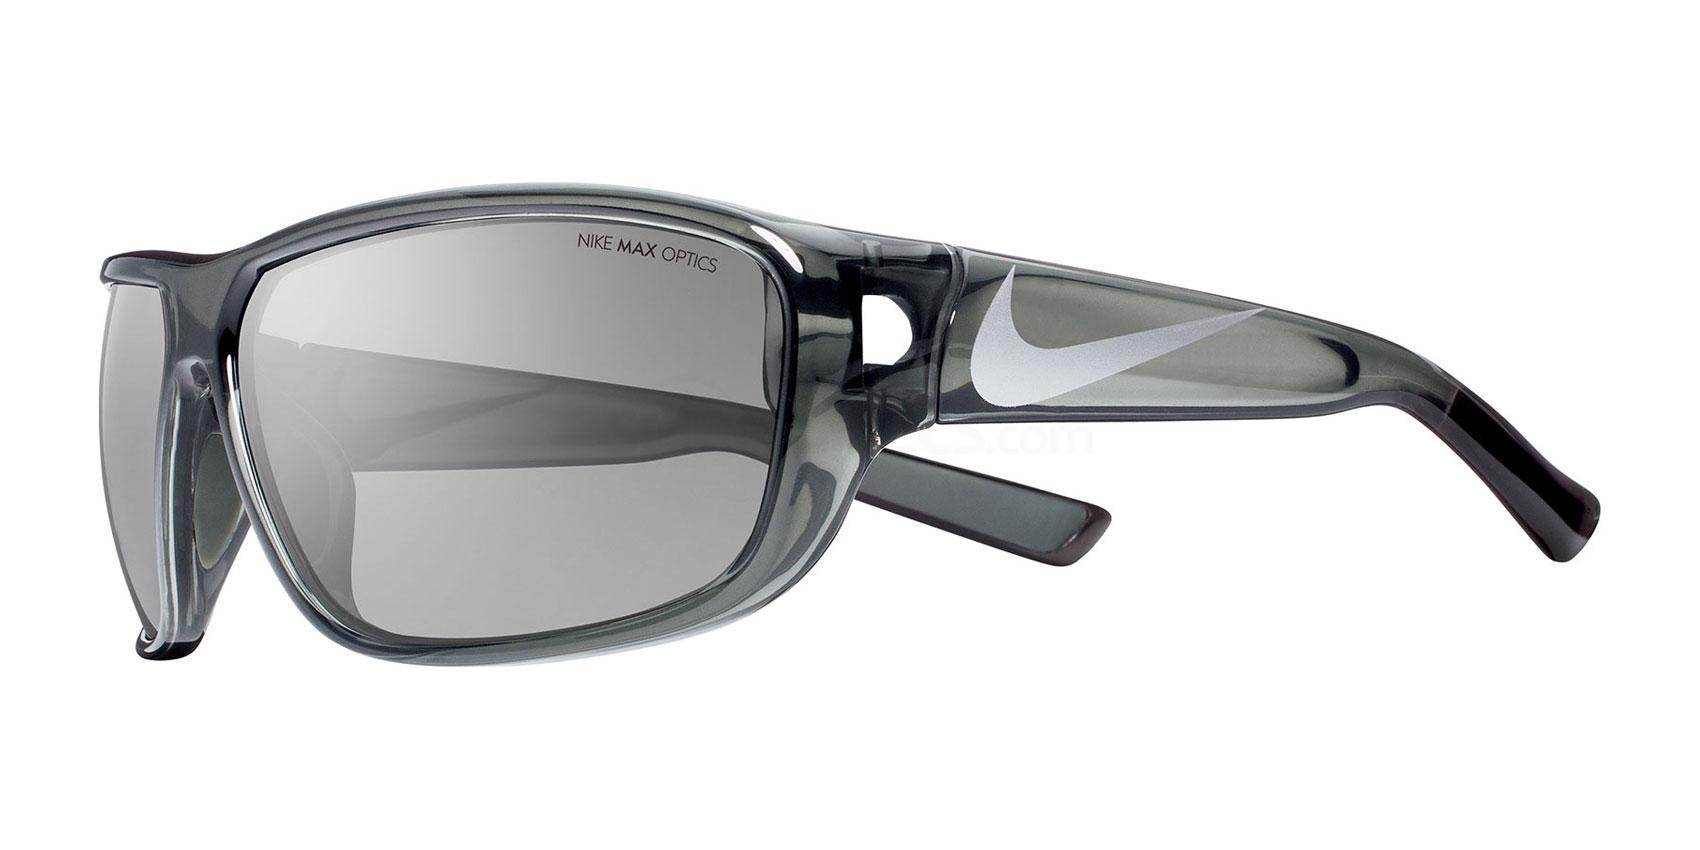 011 NIKE MERCURIAL 8.0 EV0781 Sunglasses, Nike